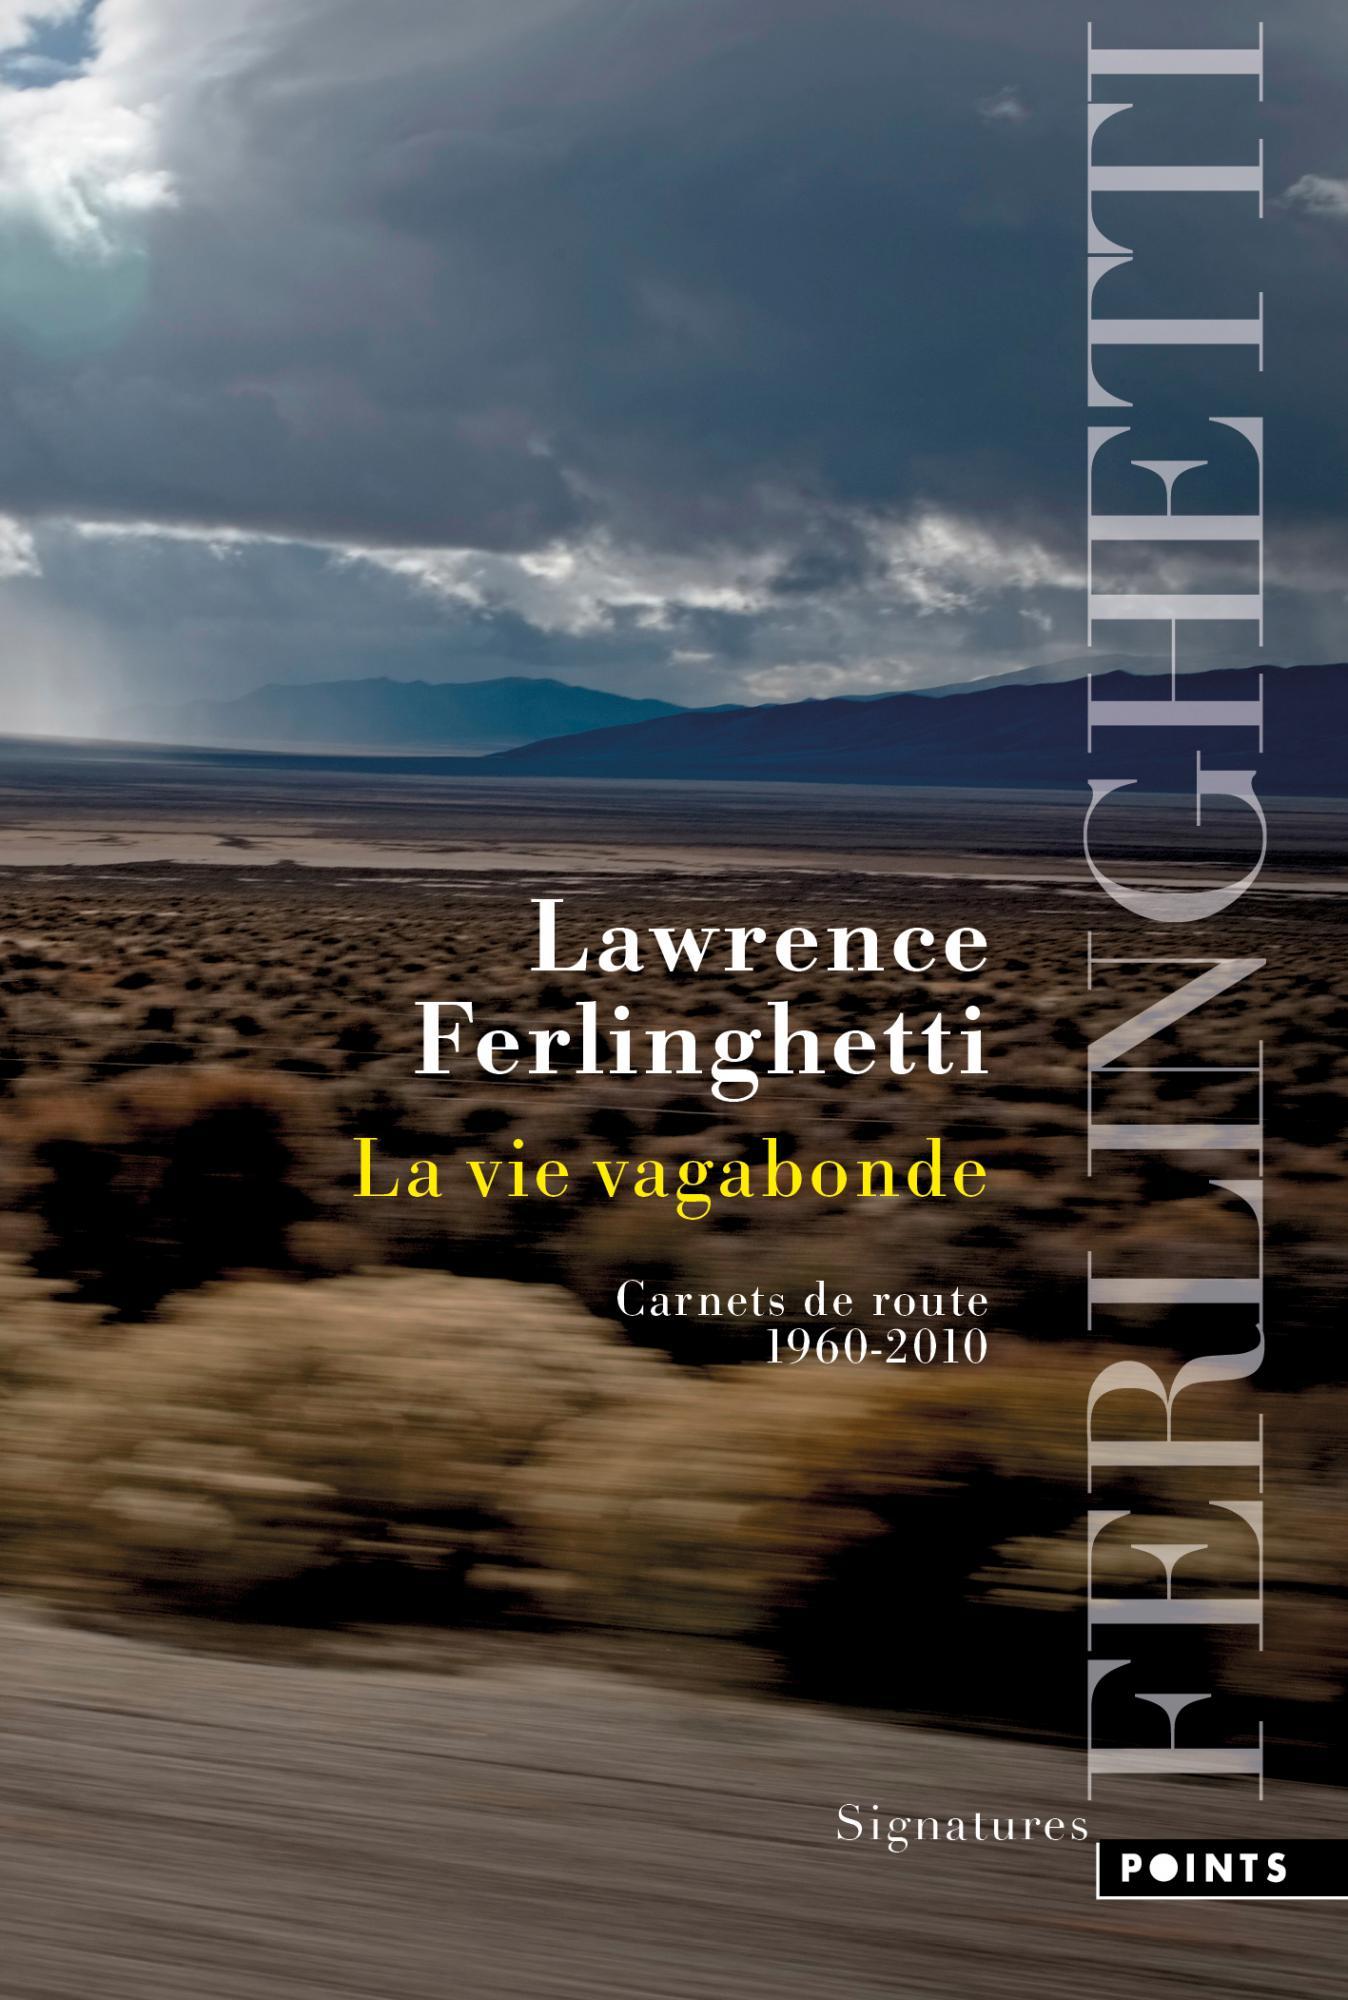 La Vie vagabonde (fr language, Points)